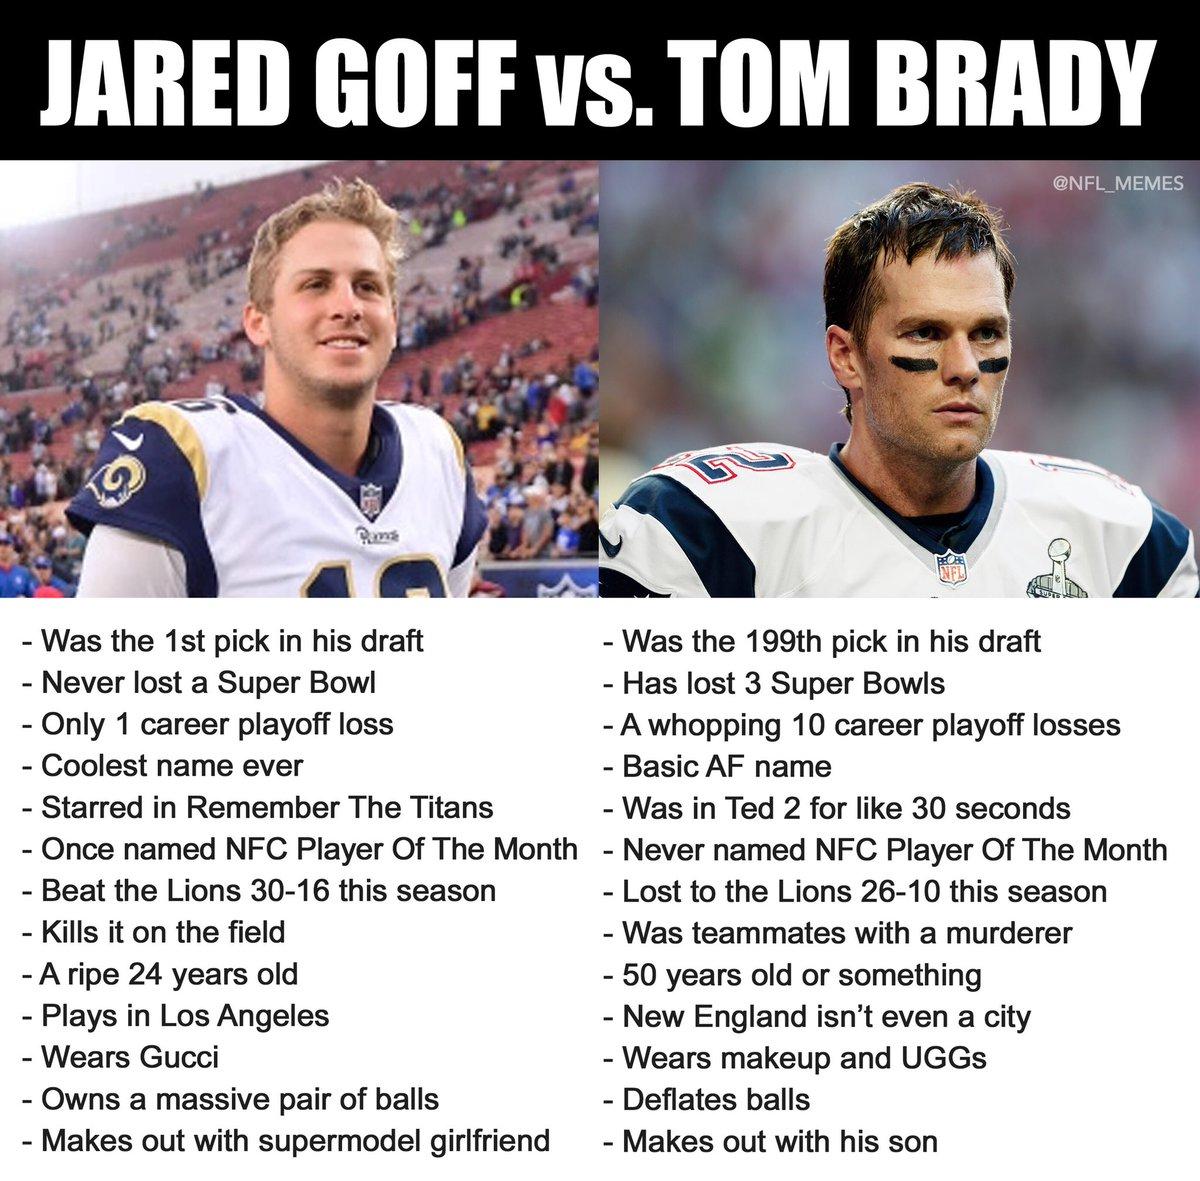 Nfl Memes On Twitter Your Super Bowl Liii Qb Matchup